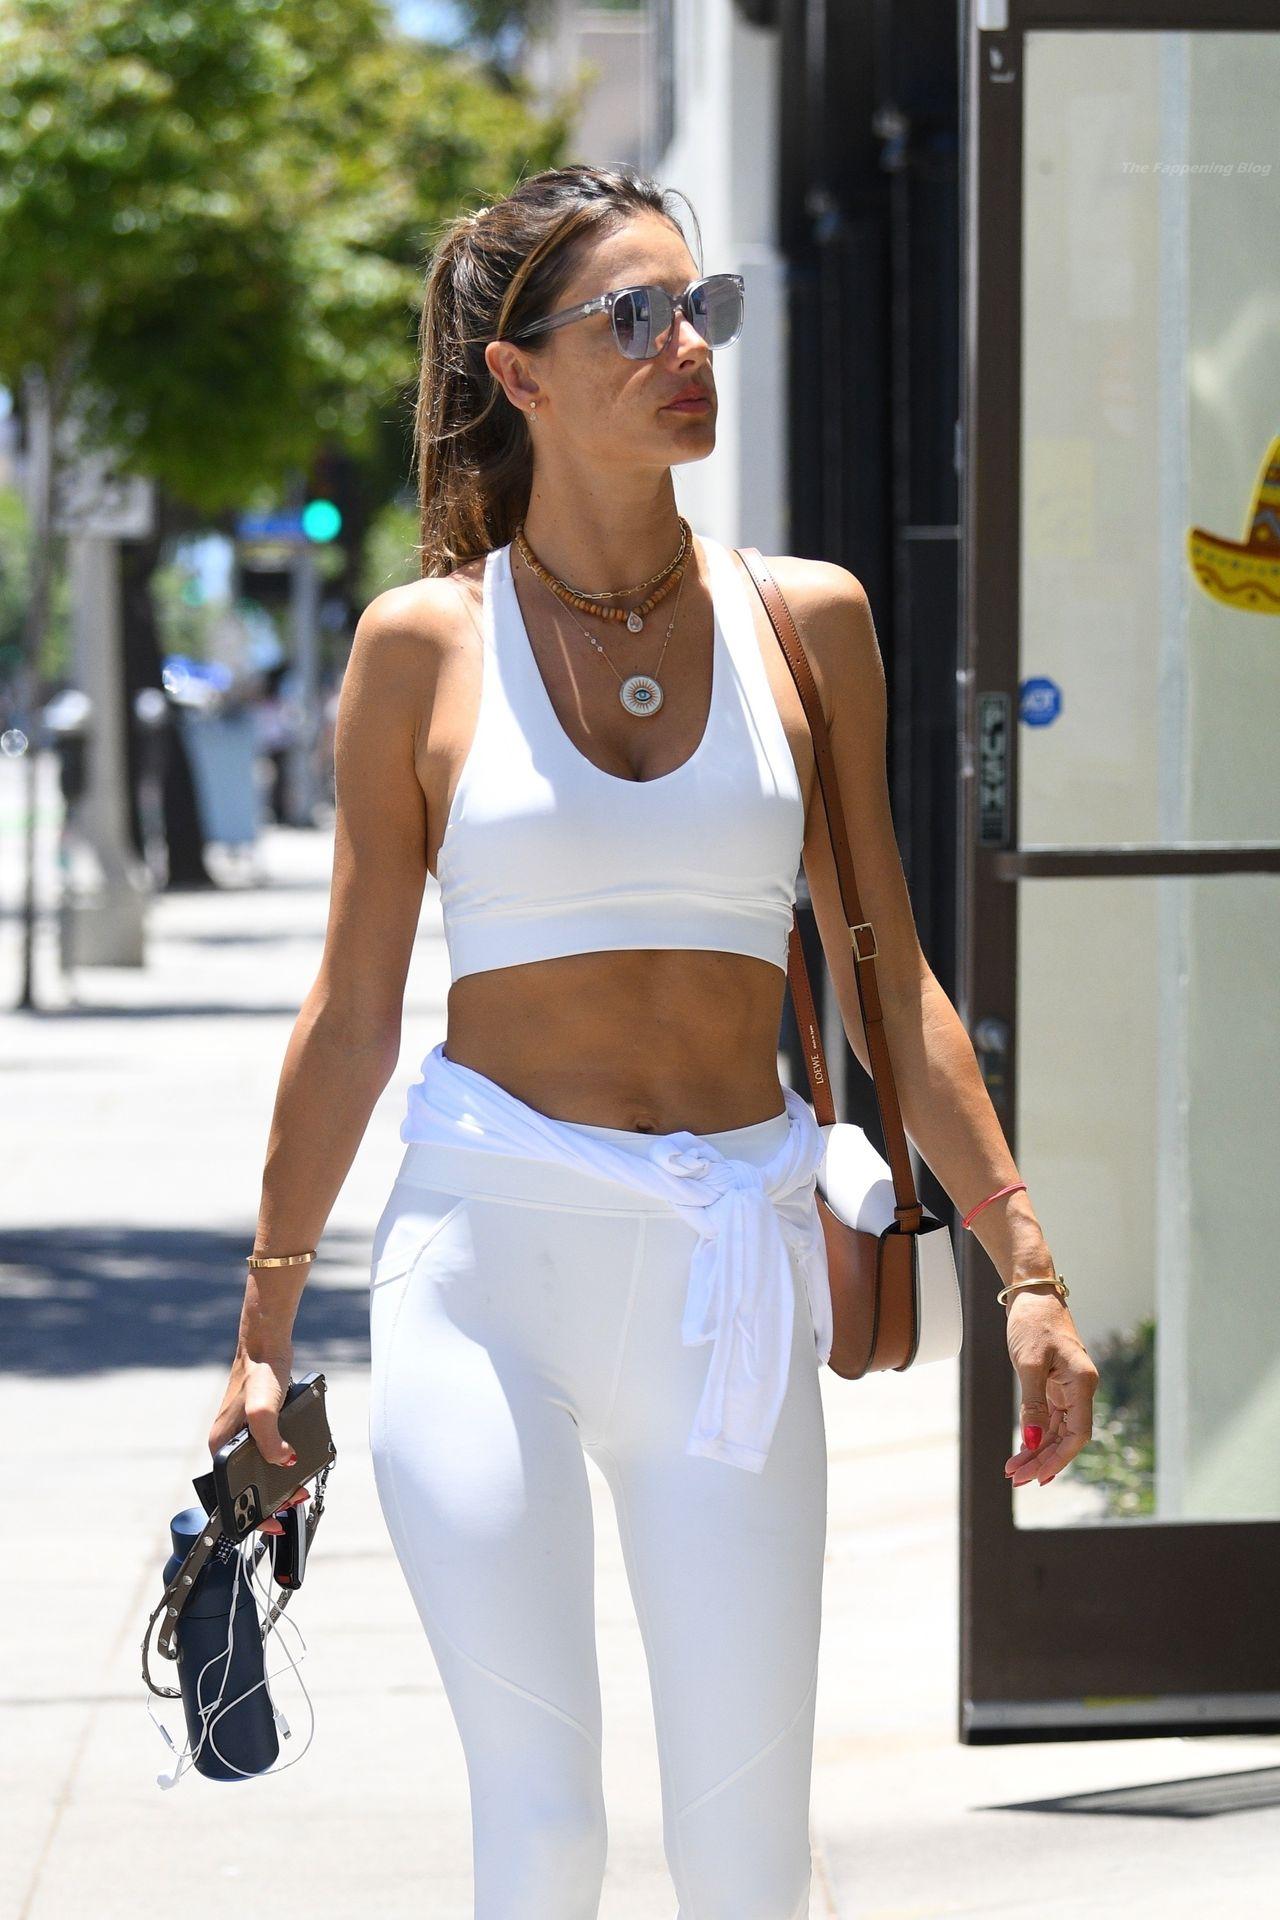 Alessandra-Ambrosio-Sexy-69-leakedmodels.com_.jpg